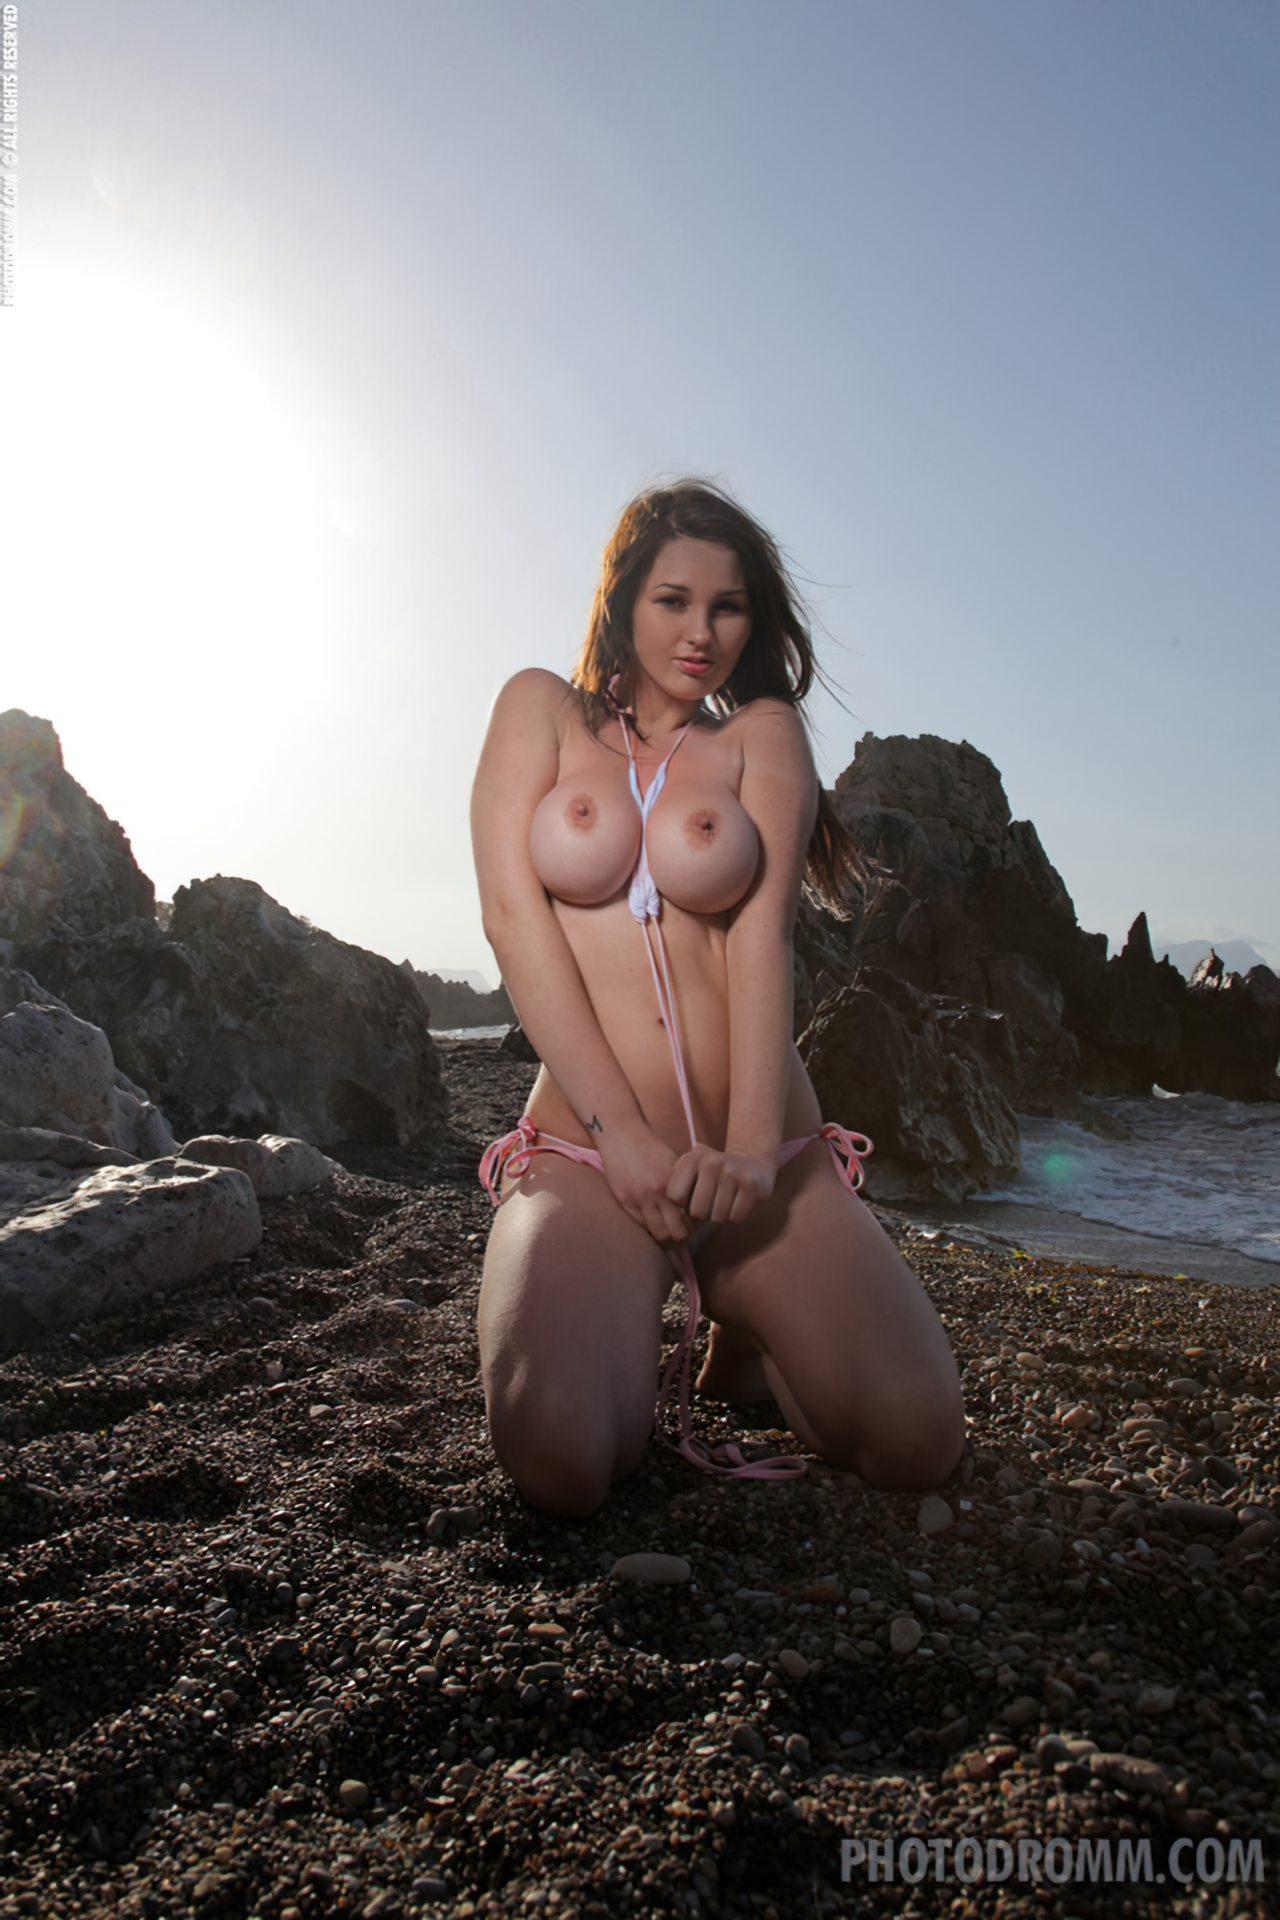 Mulher Nua Praia (1)